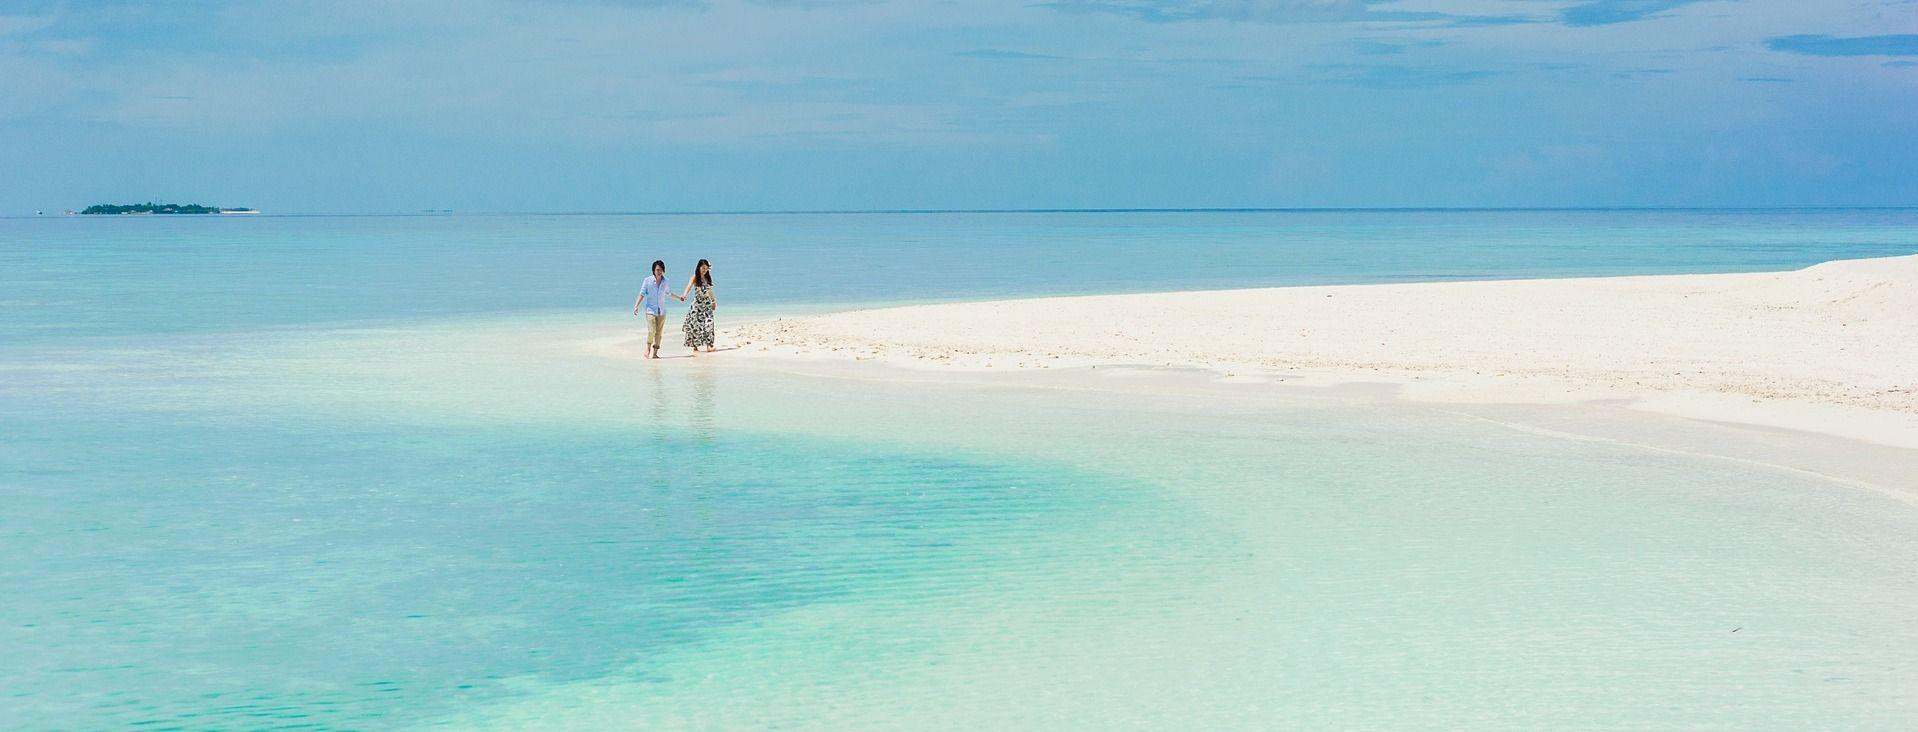 Zašto putovati na Maldive?